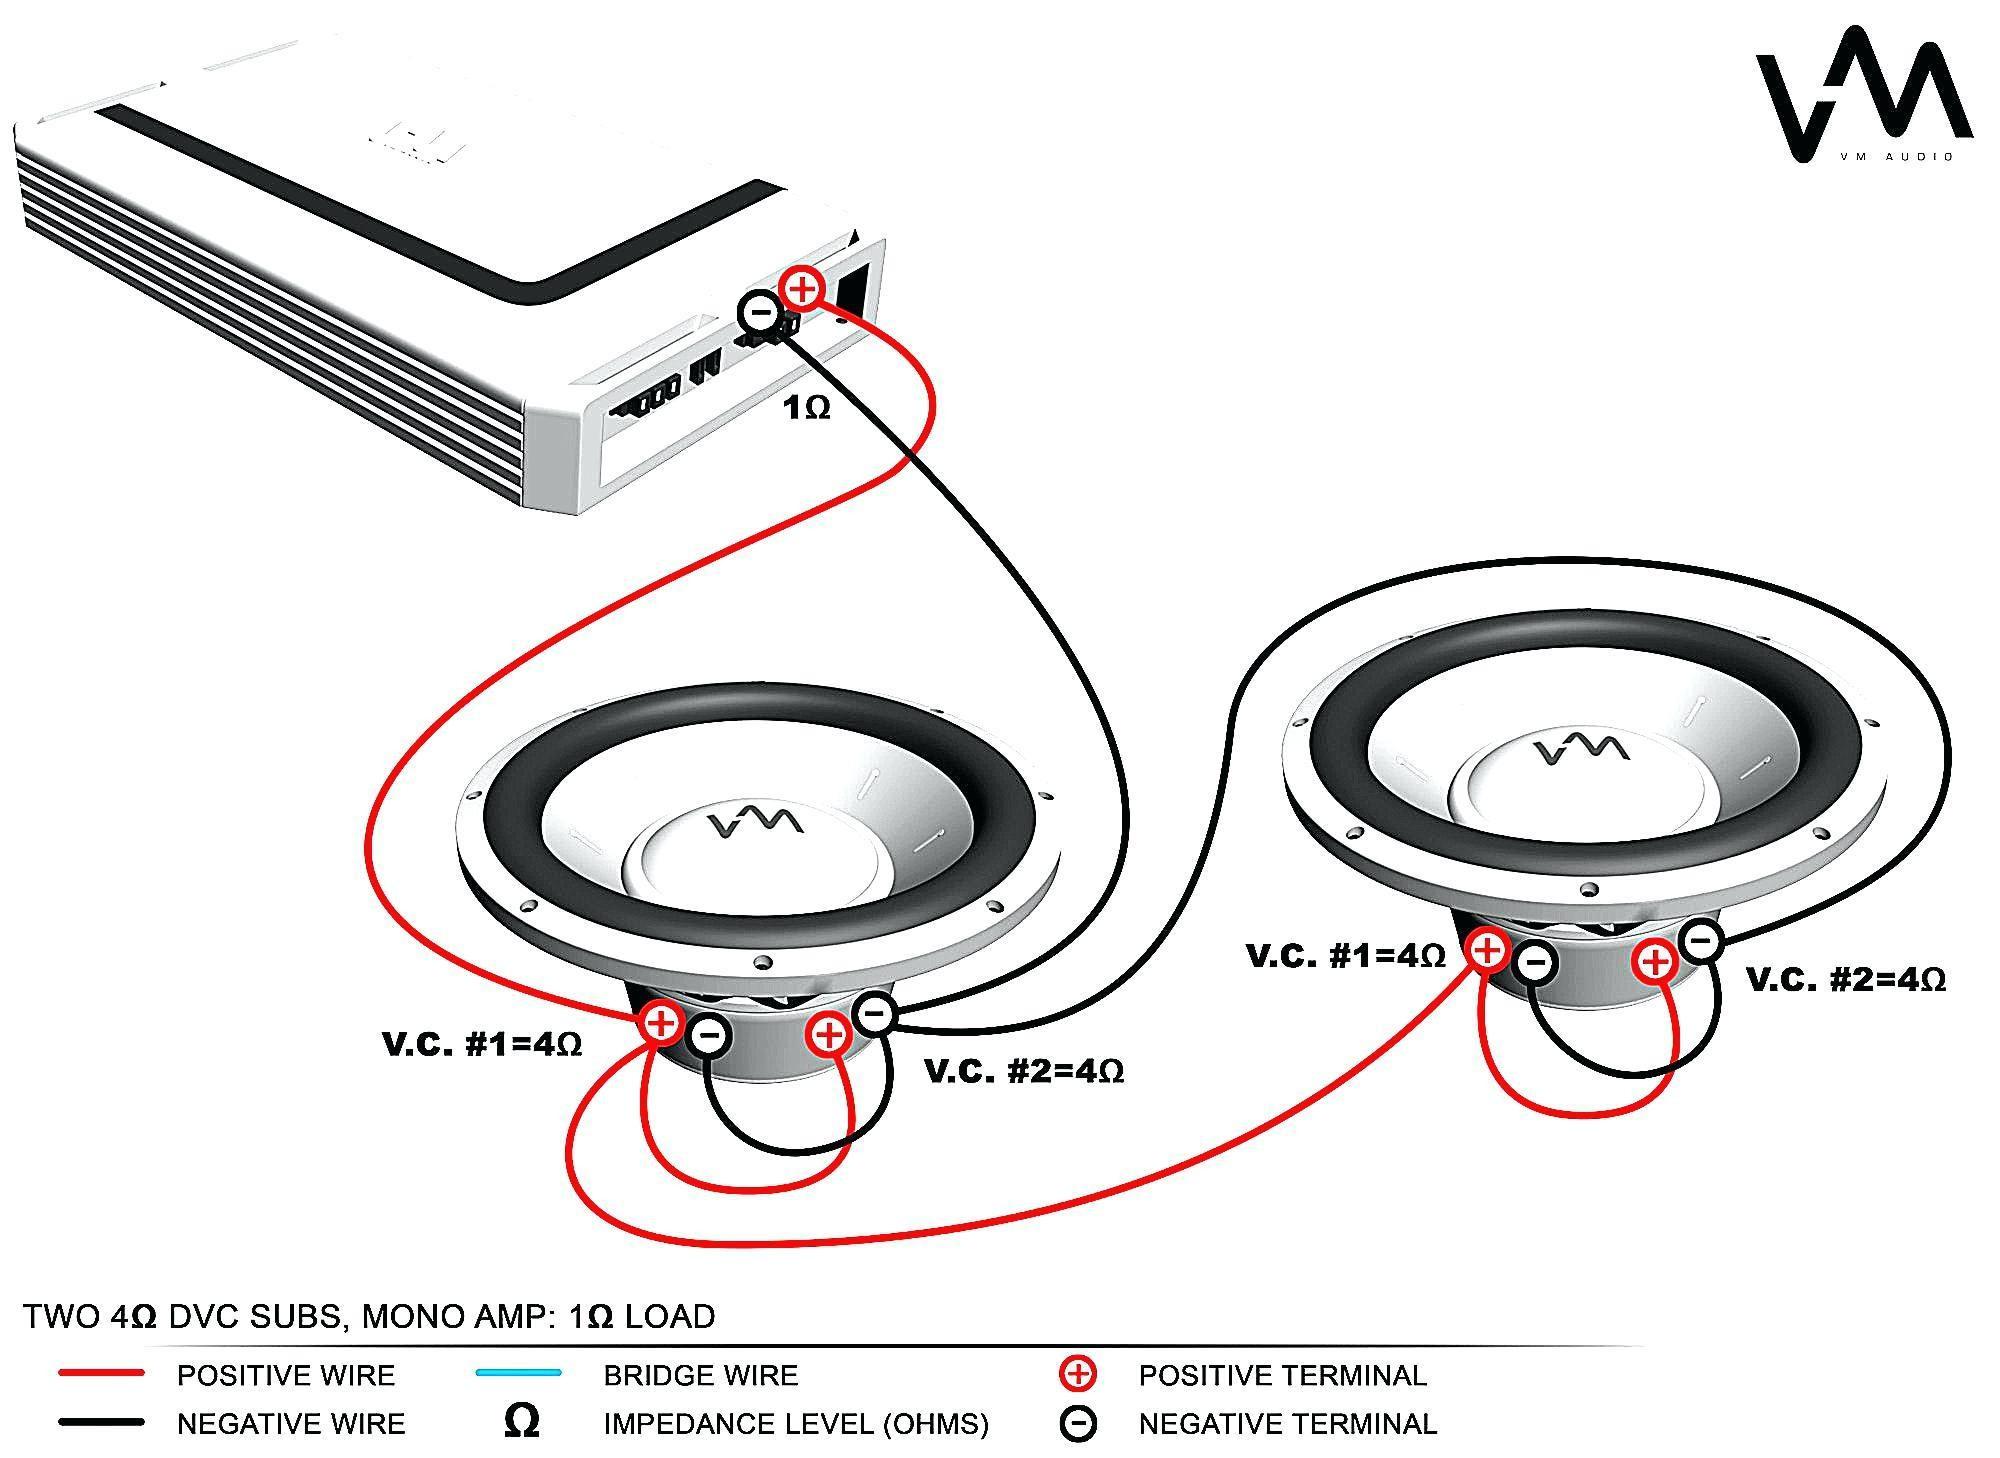 Solar Baric L5 Lovely Wiring Diagram Kicker Solo Bark Like 12